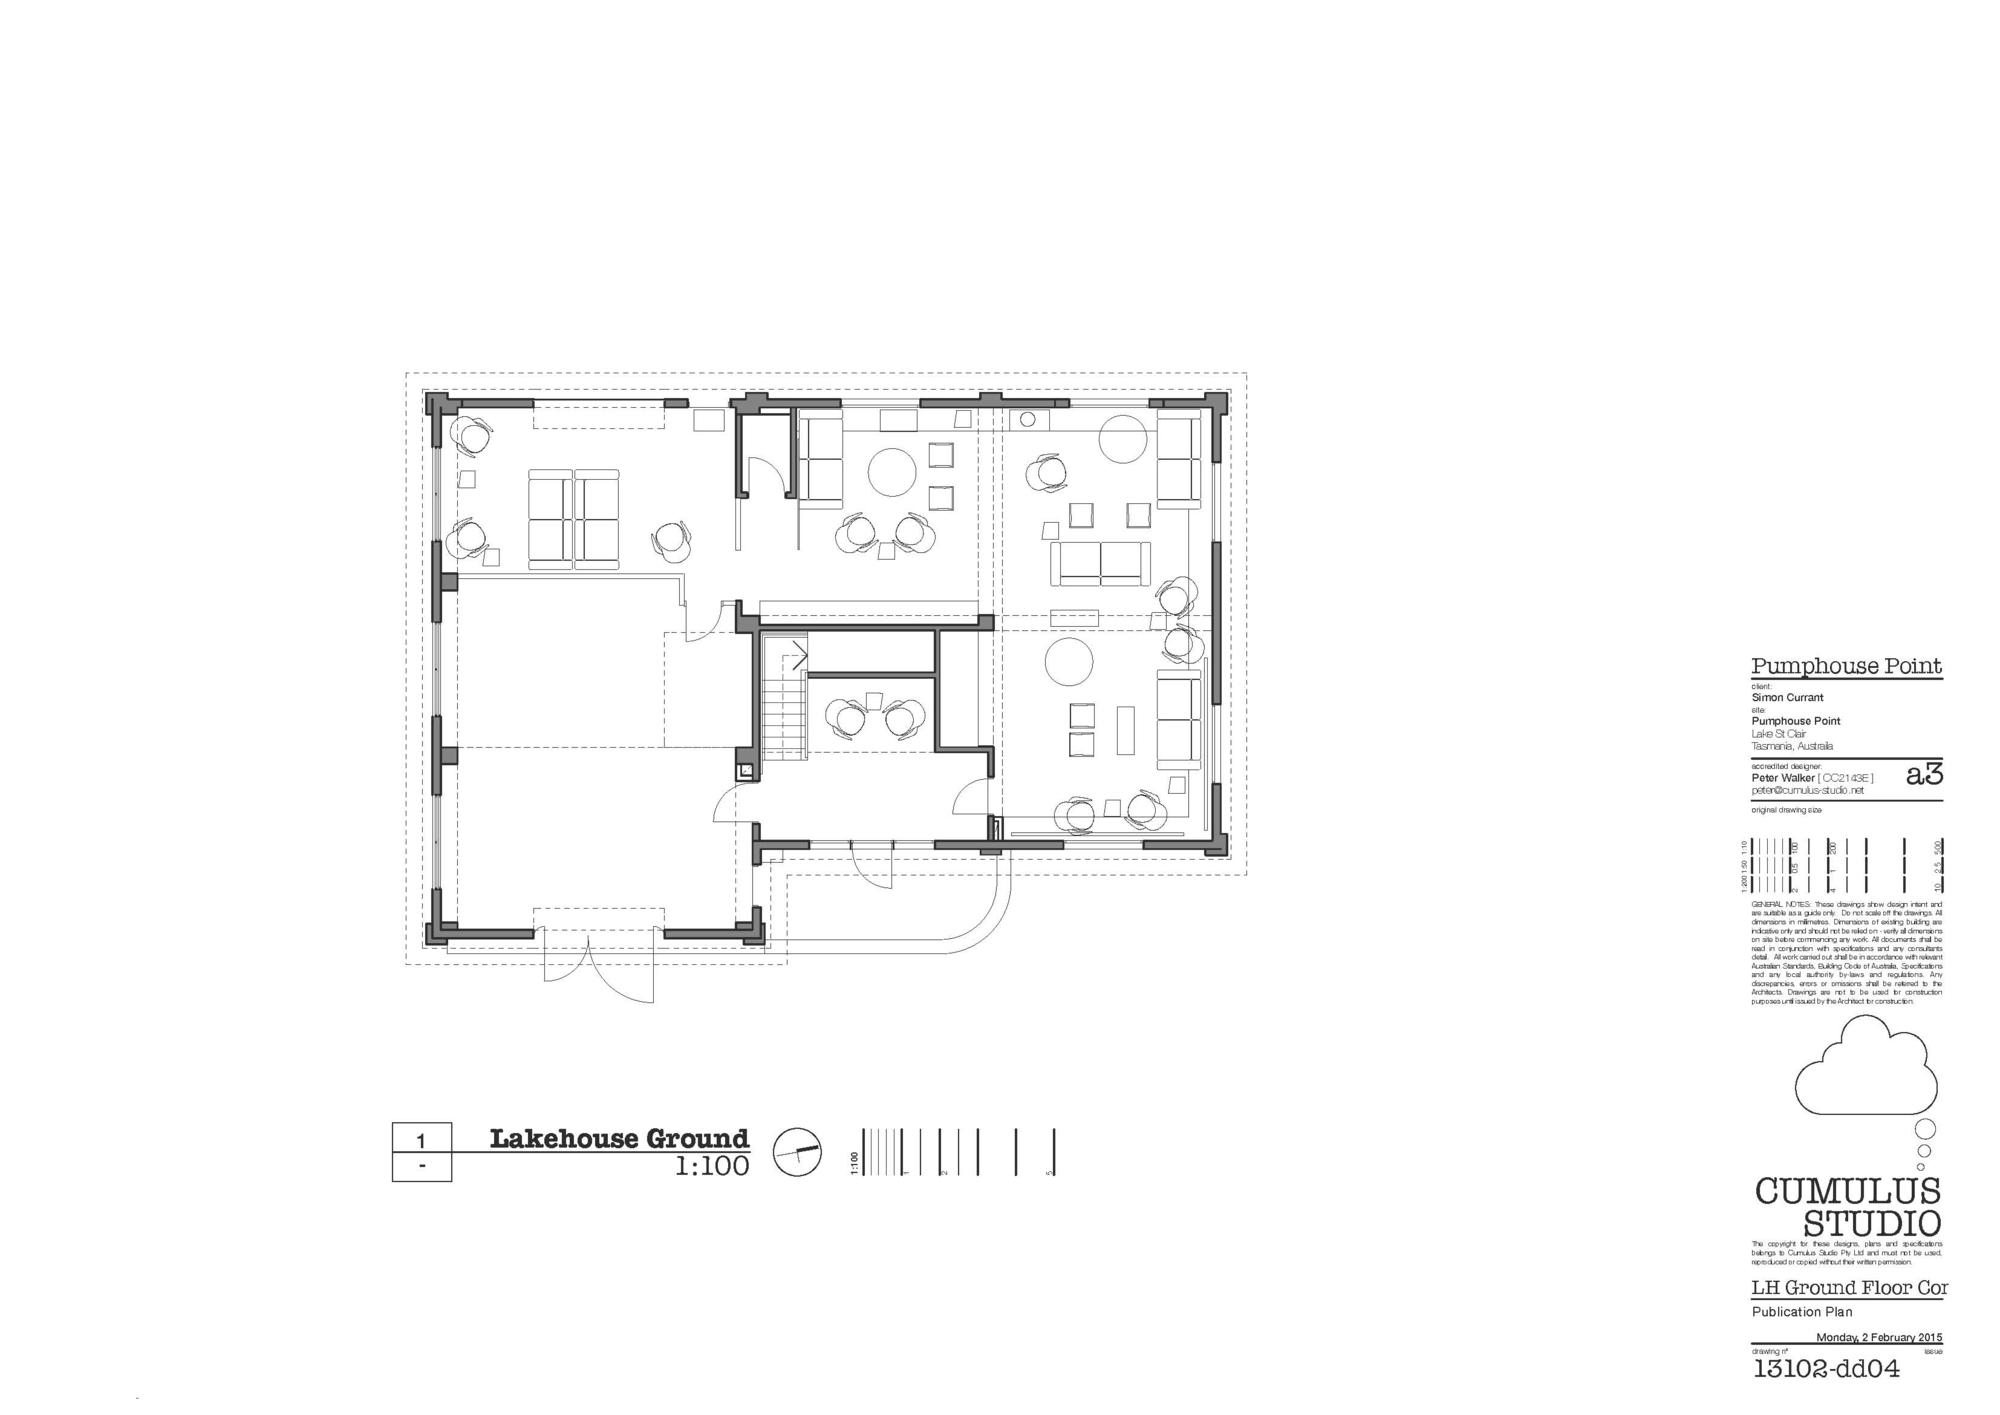 Pumphouse_Point-Cumulus_Studio-33